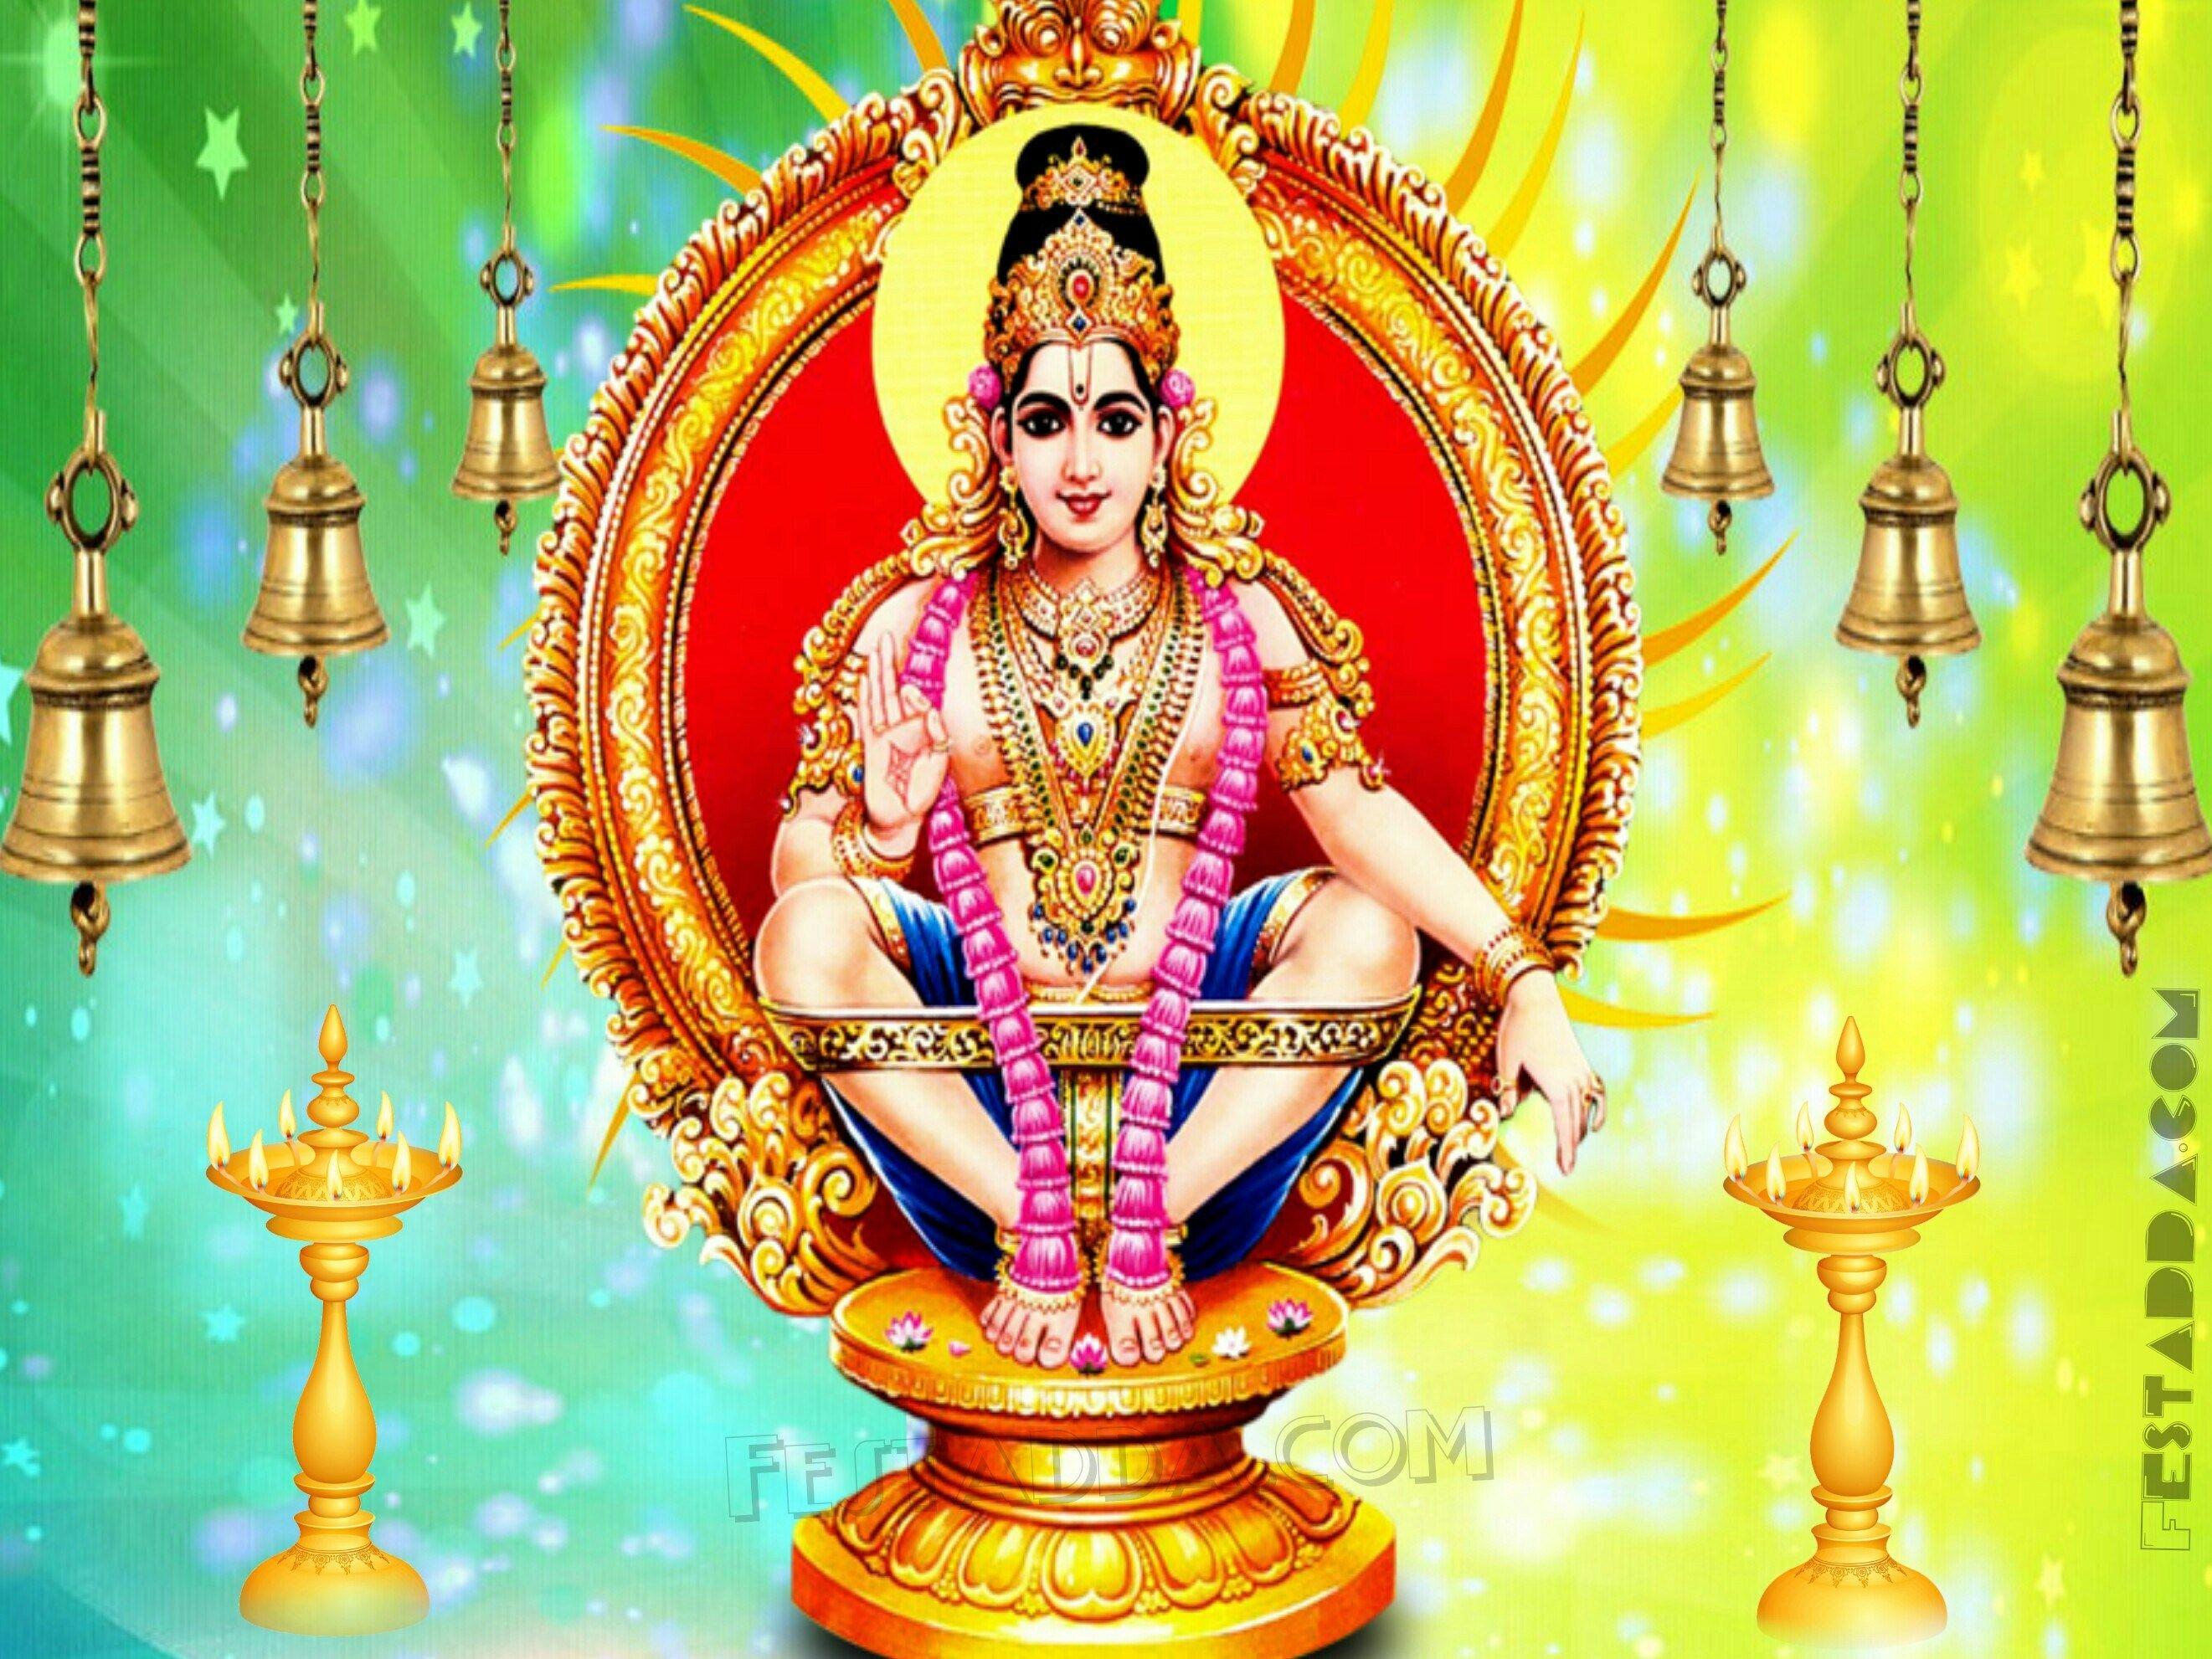 ayyappa swamy image s hd 1080p download wallpaper images hd hd picture hd photos ayyappa swamy image s hd 1080p download